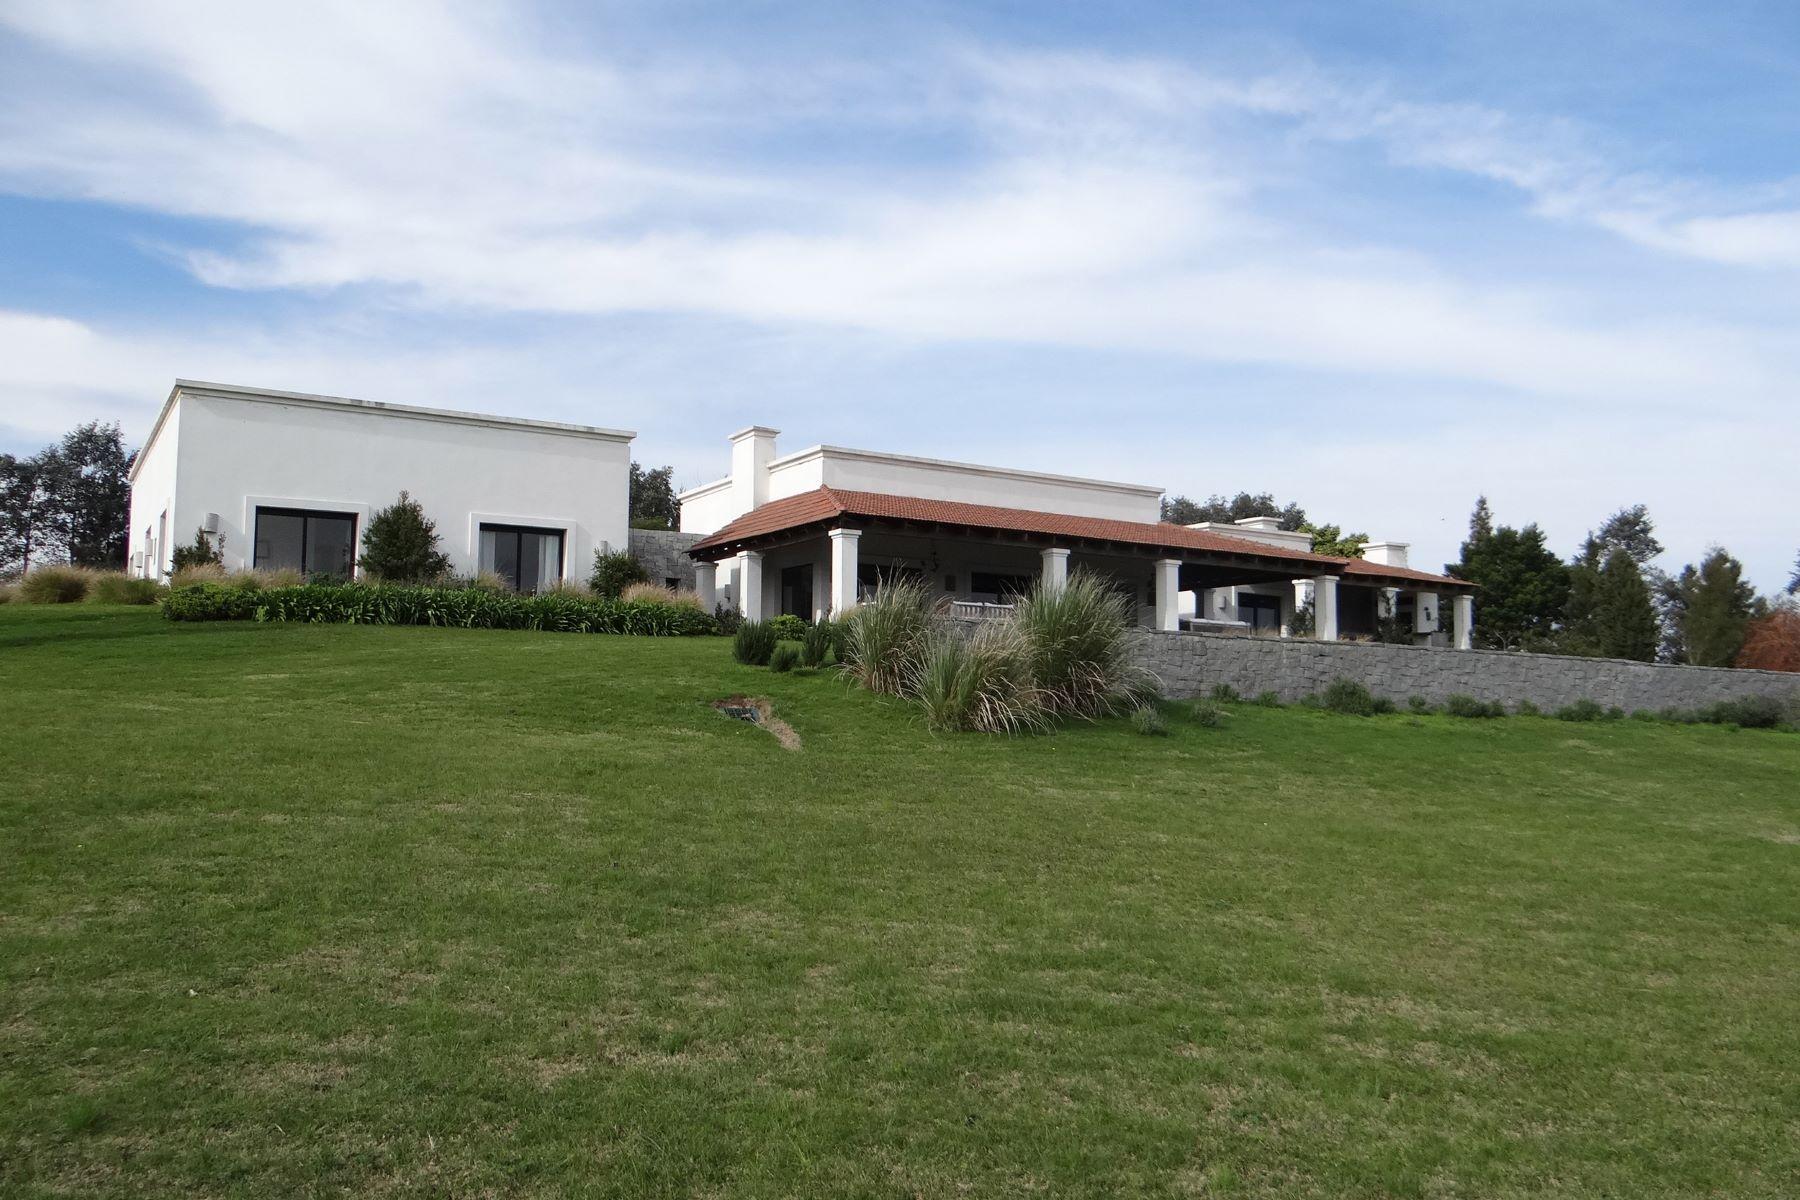 Maison unifamiliale pour l Vente à Chacra Cruz del Sur Maldonado, Maldonado, Uruguay